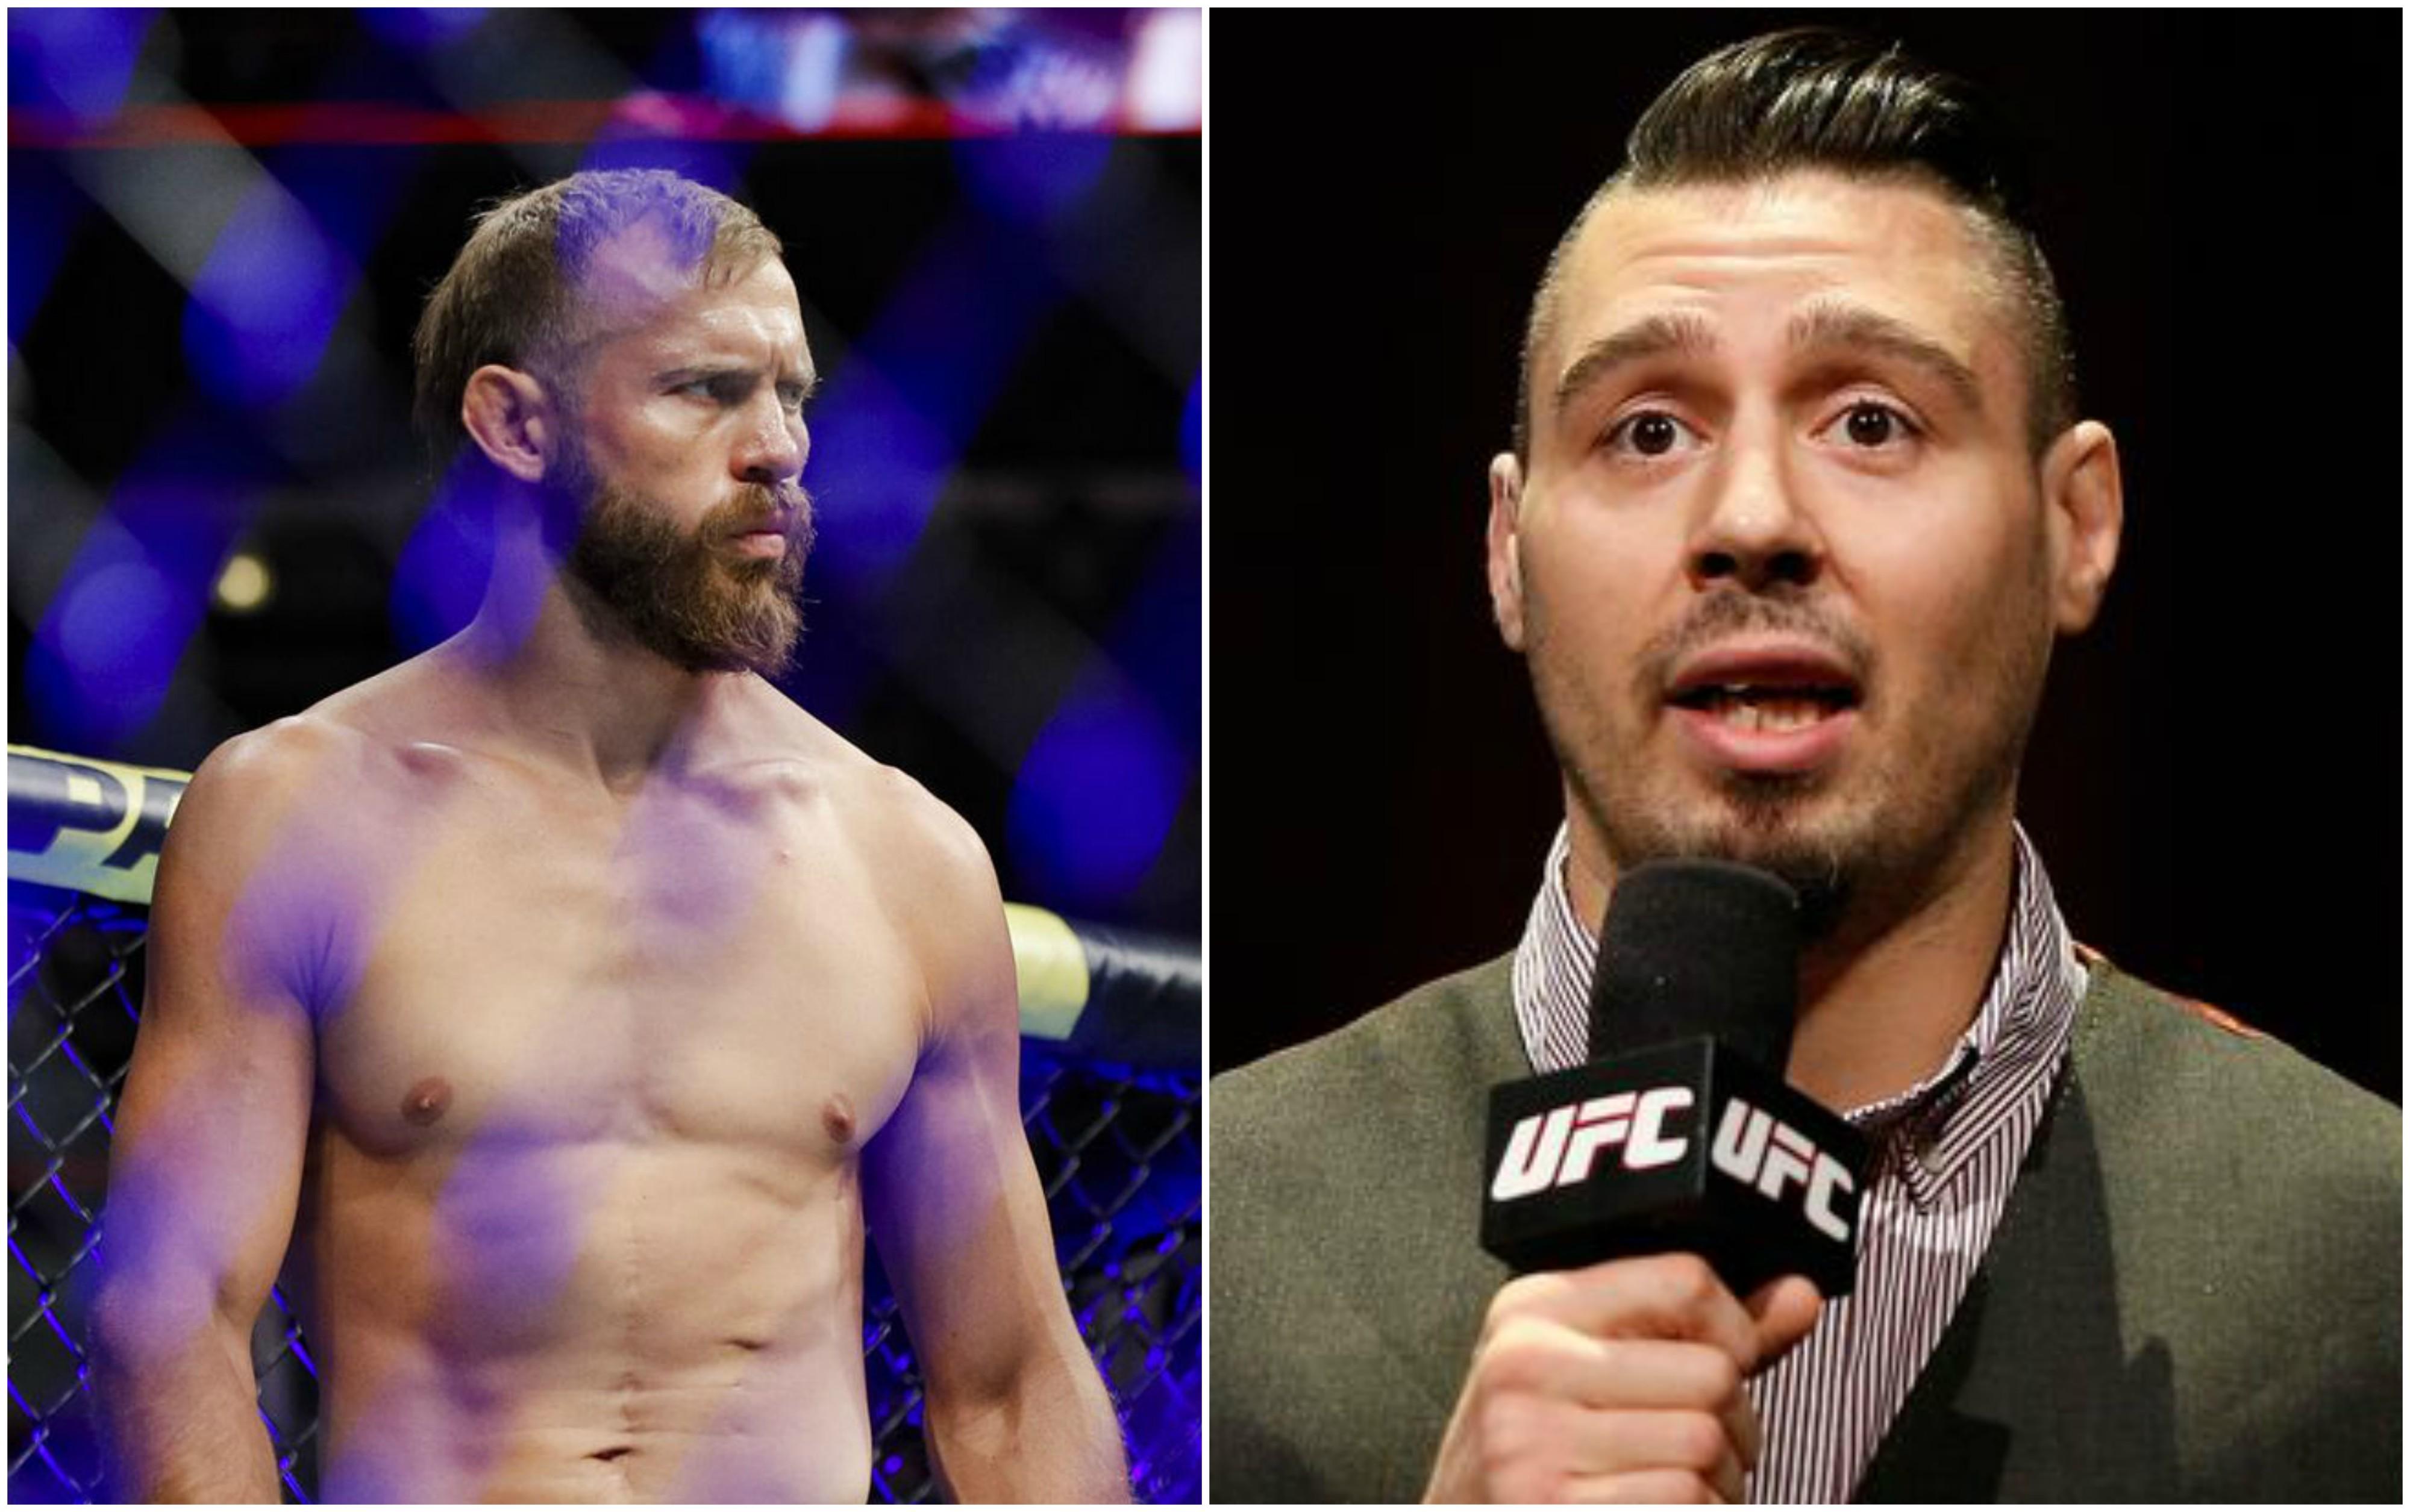 UFC News: Dan Hardy sets his sights on Donald Cerrone for return fight - Dan Hardy